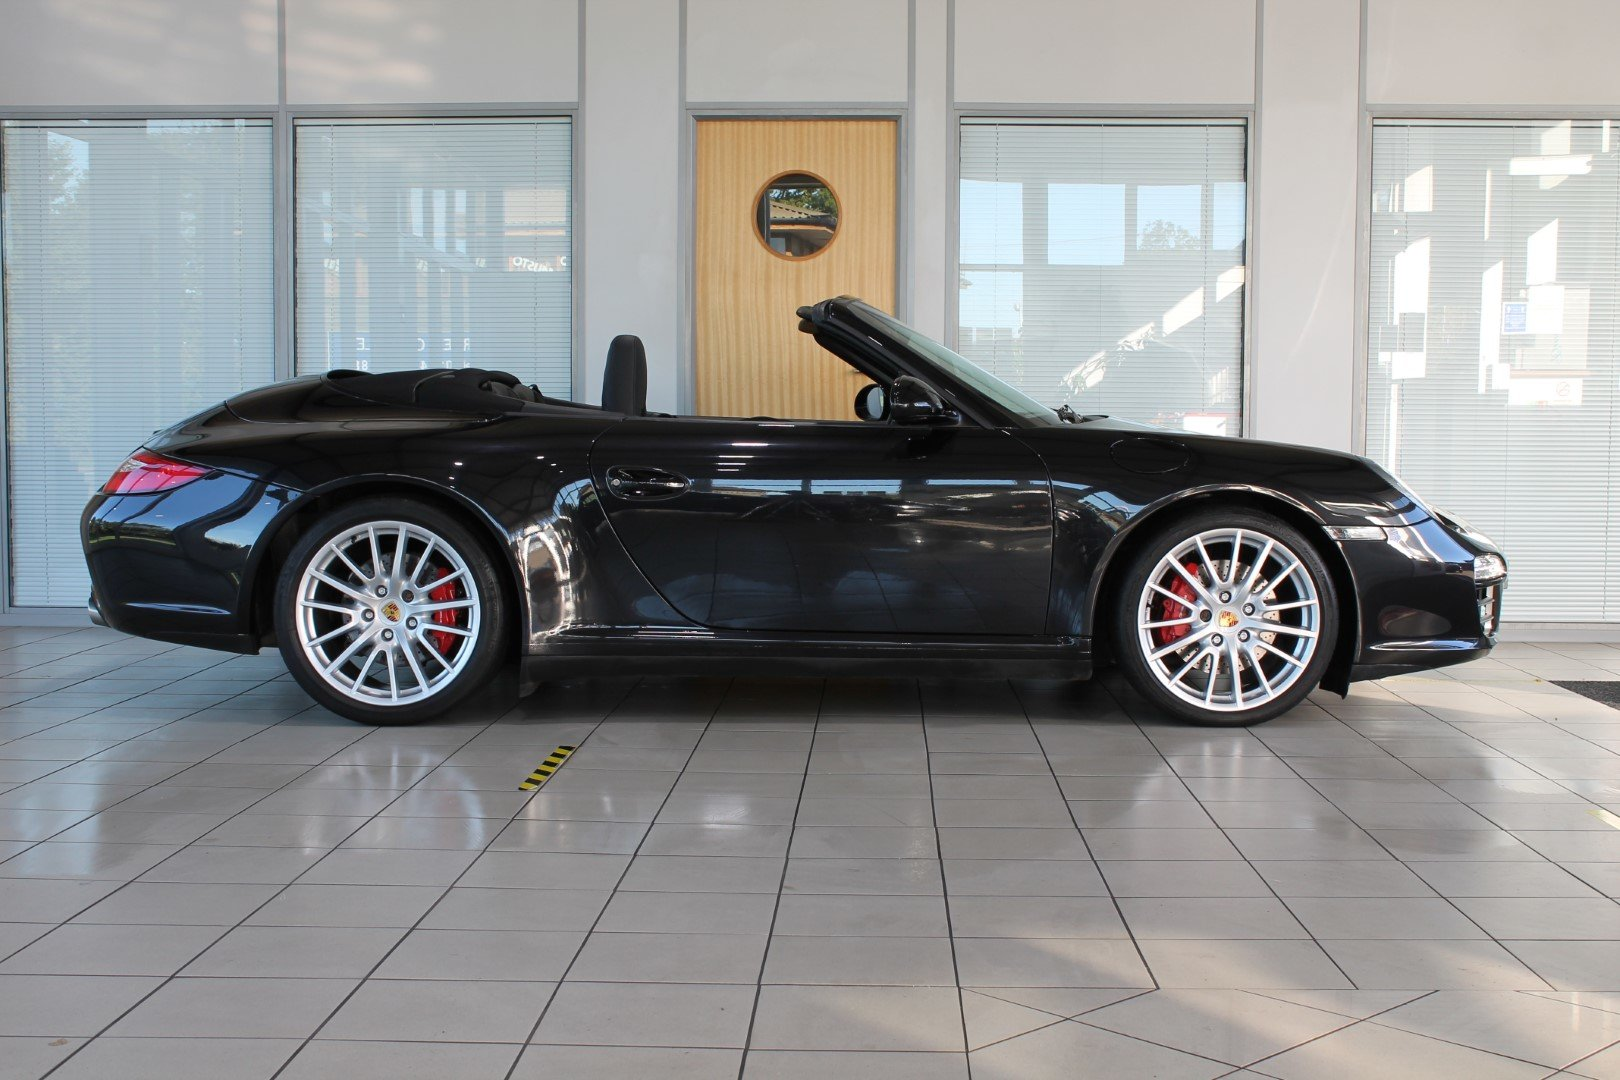 2009 Porsche 911 (997) 3.8 C4S PDK Cabriolet For Sale (picture 3 of 6)